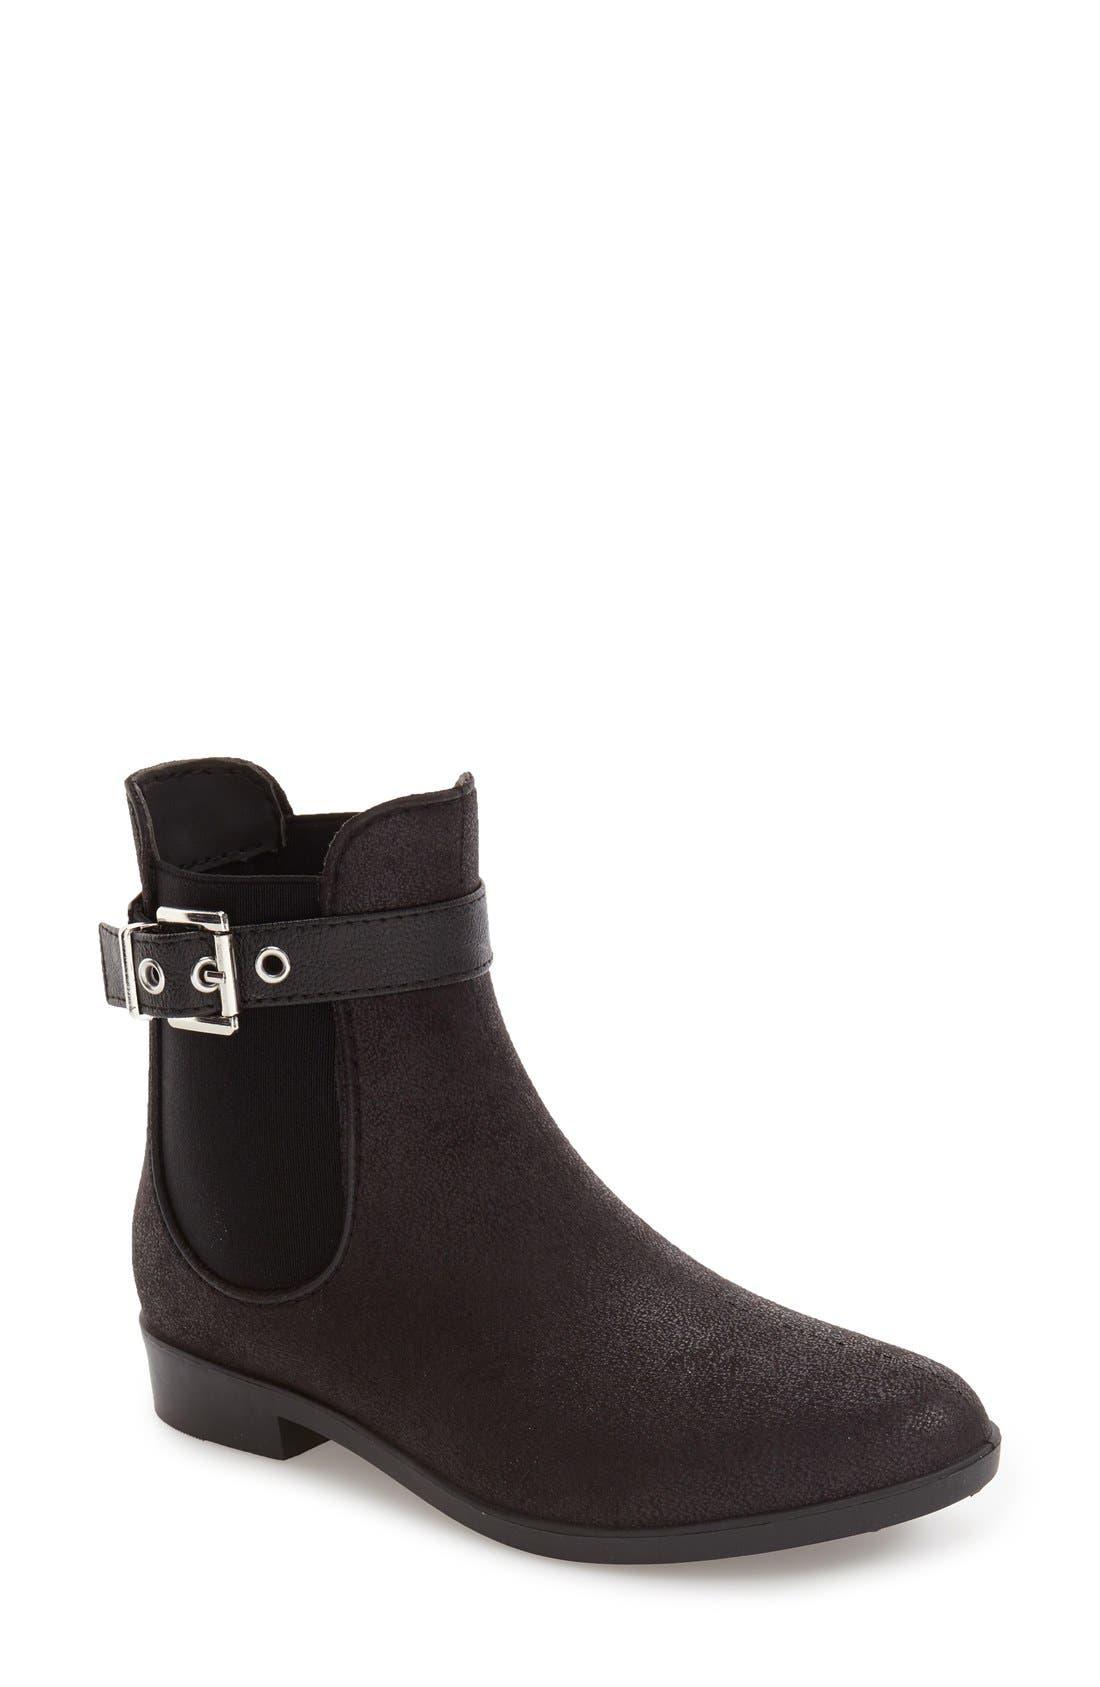 DÄV 'Glasgow' Water Resistant Chelsea Boot, Main, color, BLACK